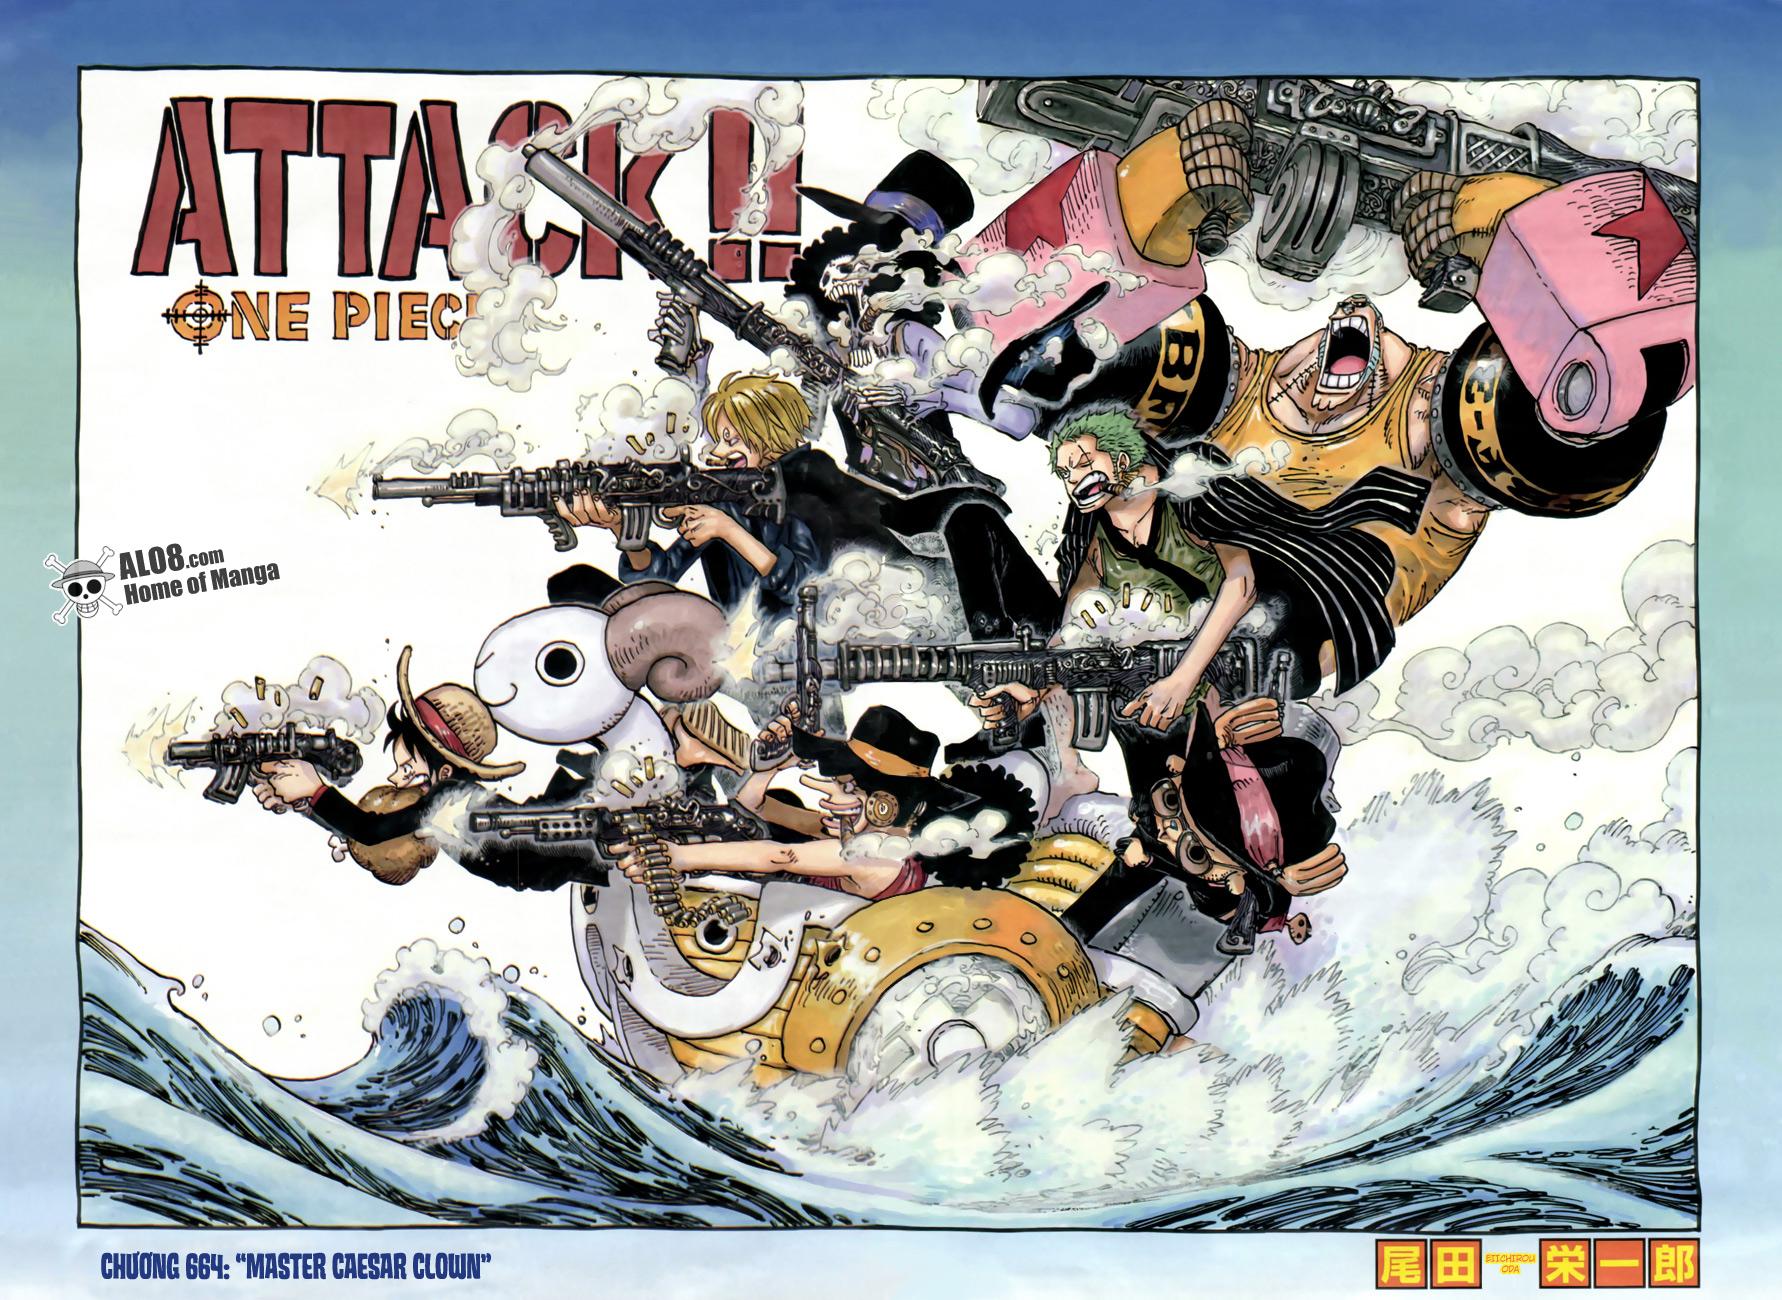 One Piece Chapter 664: Master Caesar Clown 001